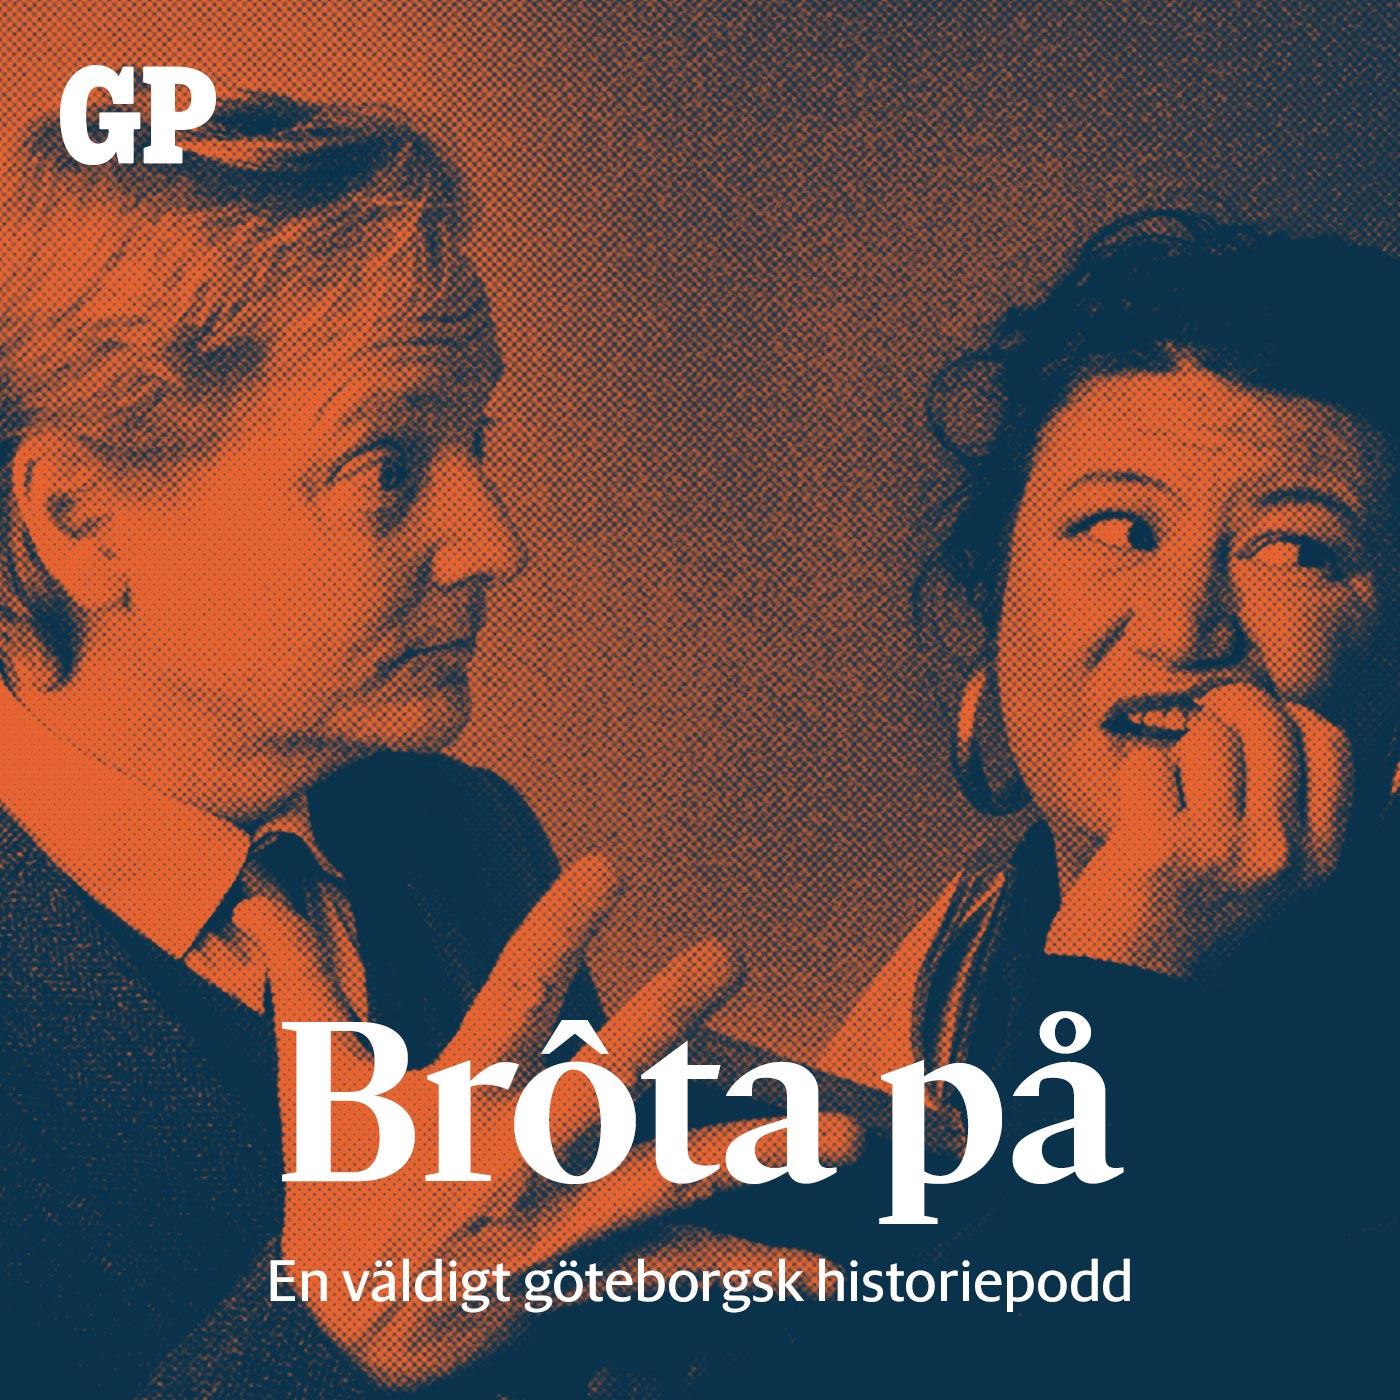 Brôta på! show art